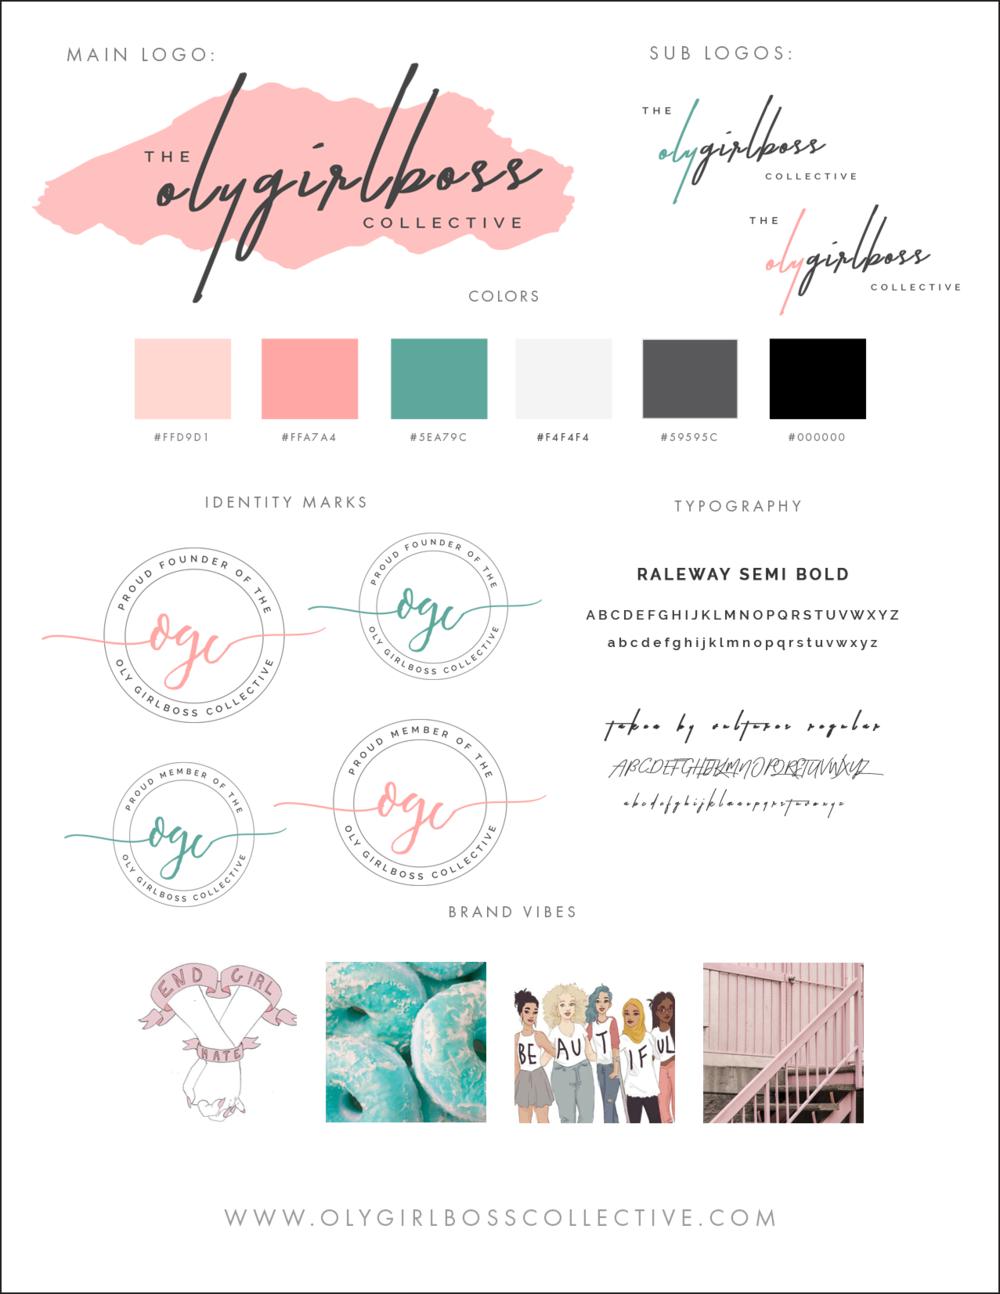 Oly Girlboss Collective - Olympia, Washington - Fashionably Frank Marketing